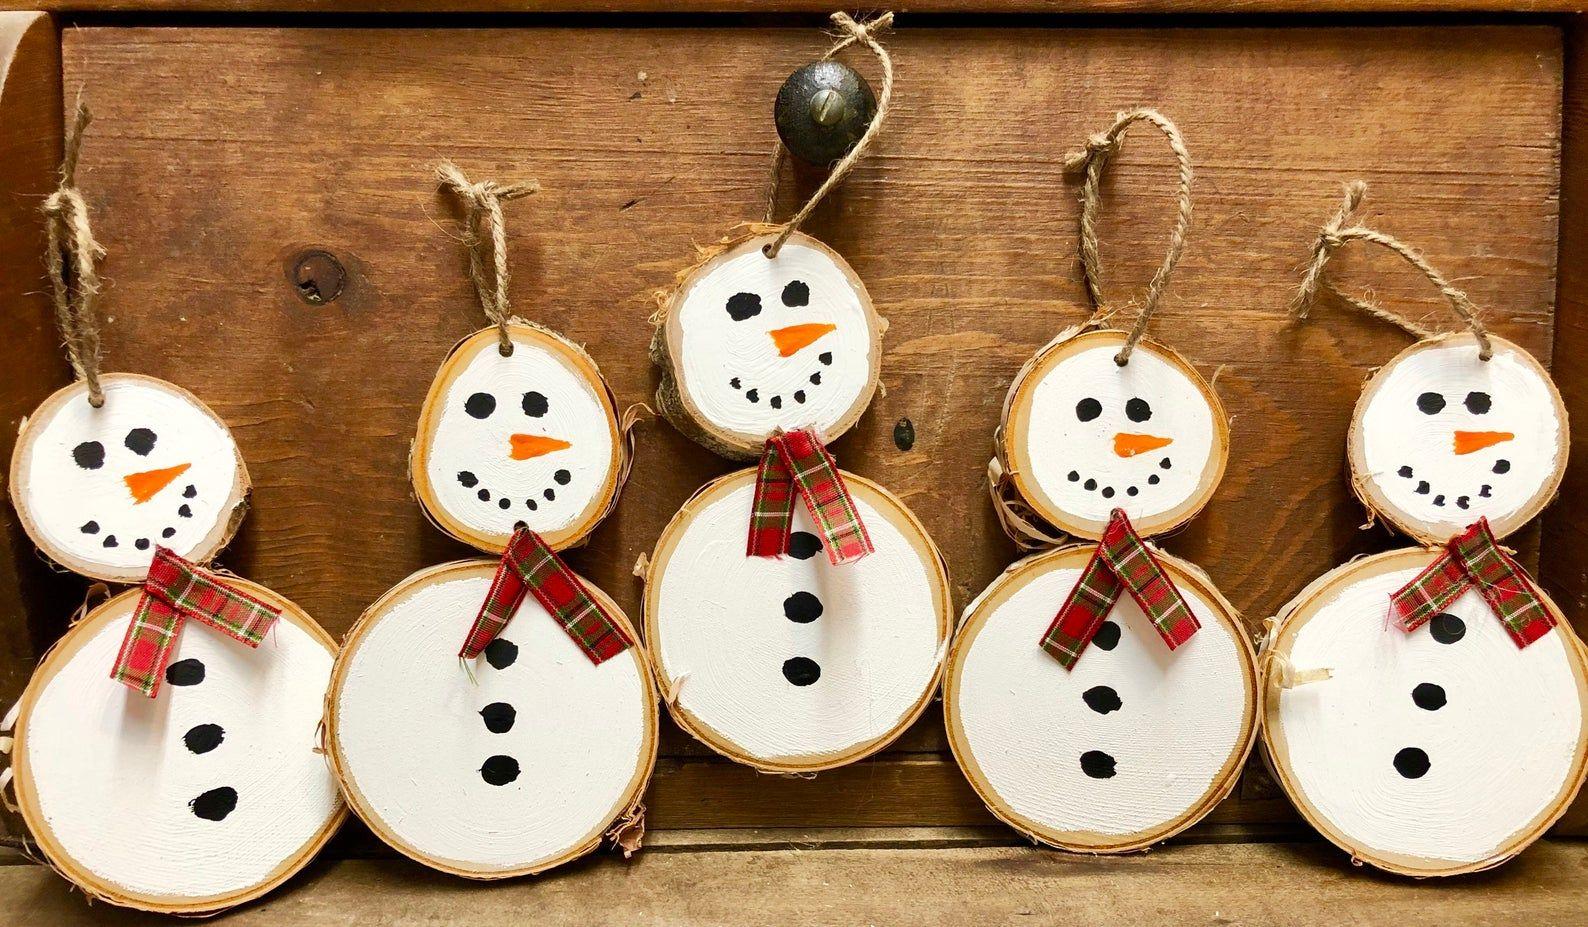 Sale Snowmen Ornaments Two Per Order Birch Snowmen Etsy Christmas Ornament Crafts Wood Christmas Ornaments Kids Christmas Ornaments